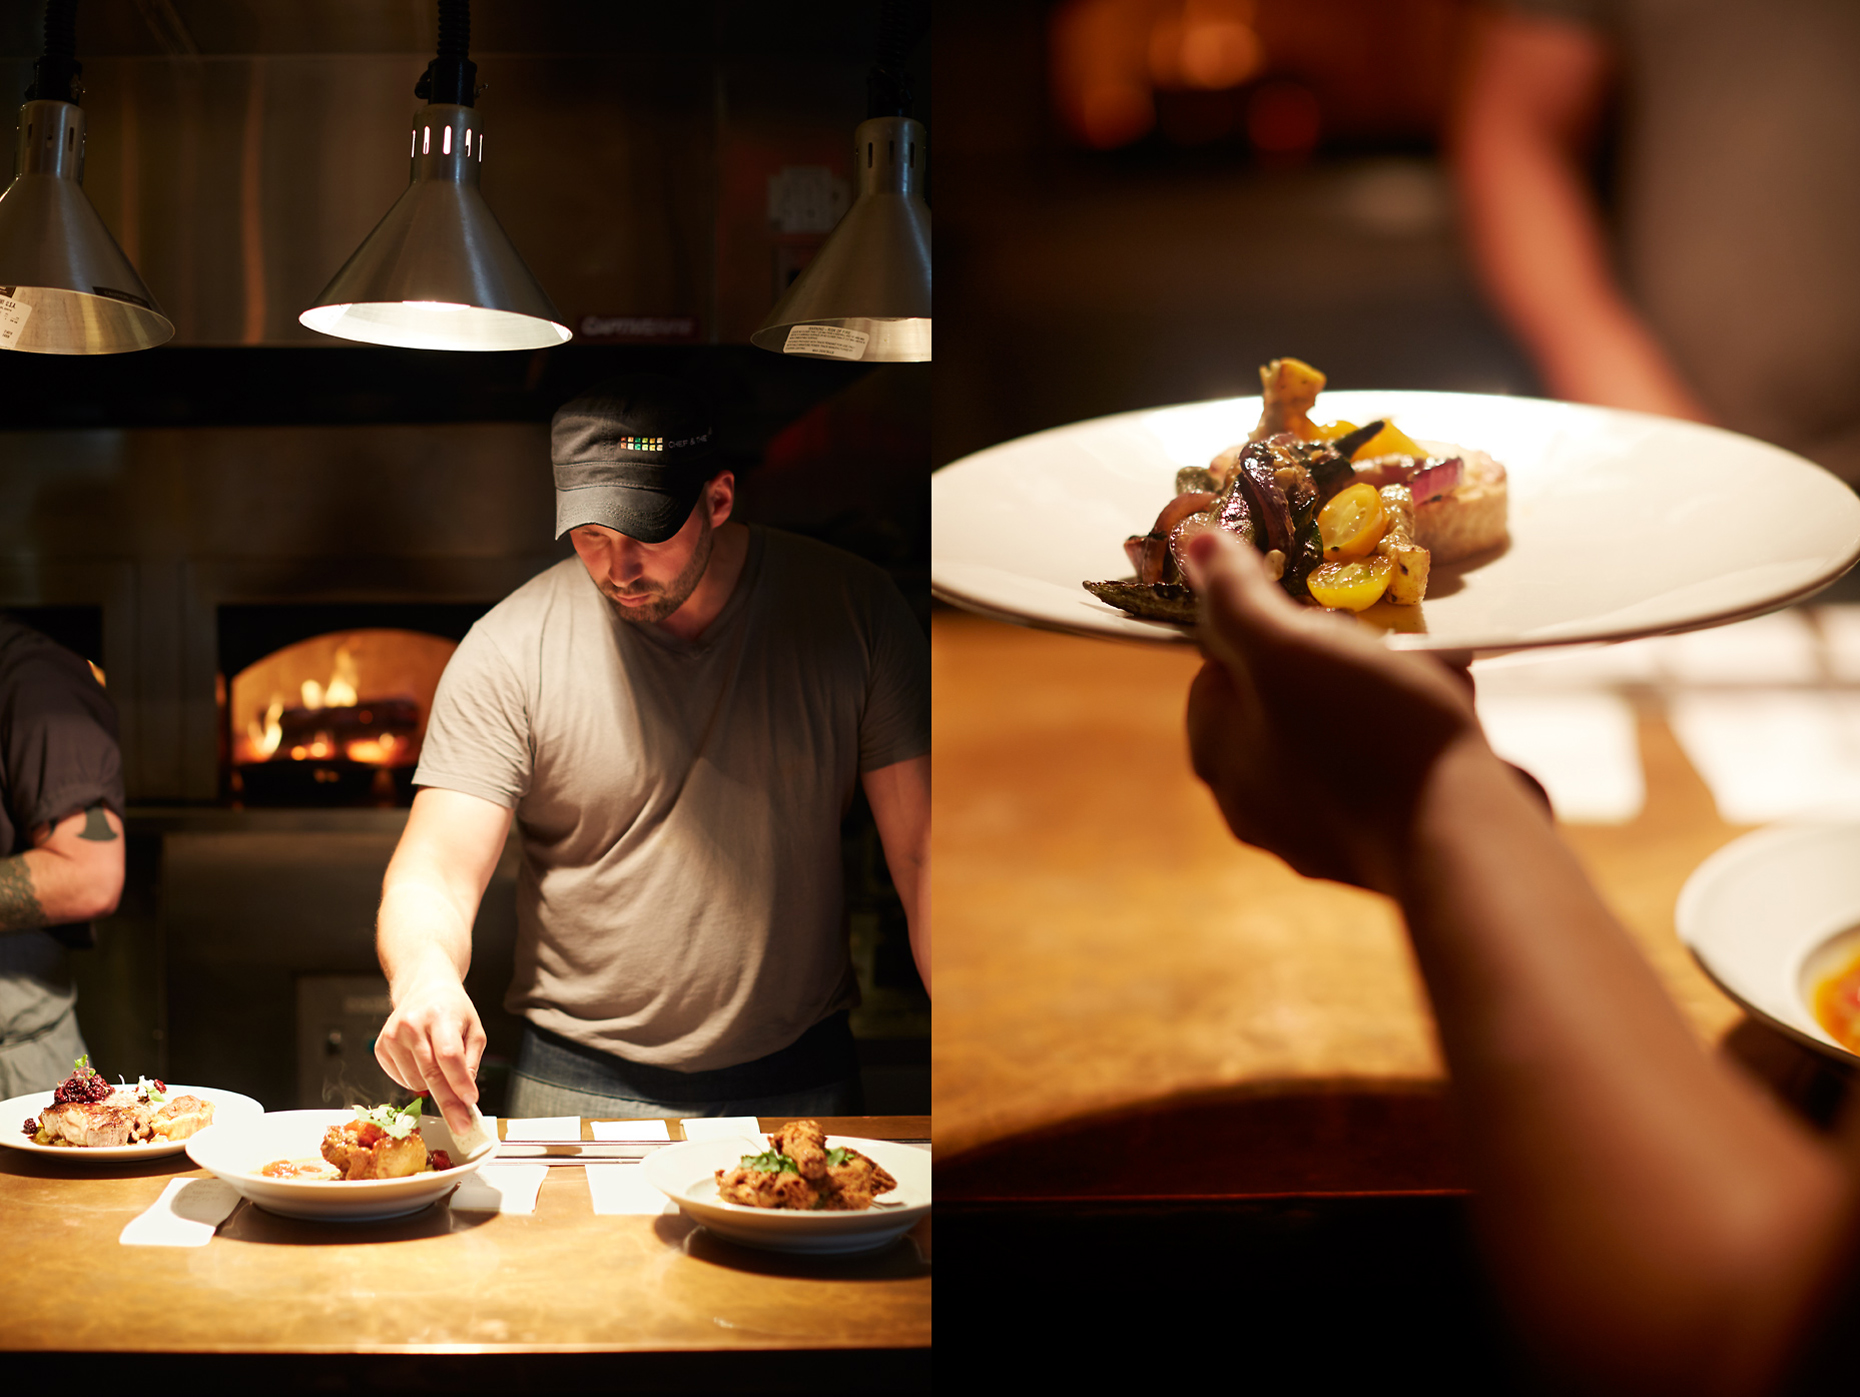 017_M_2015_0723_chefslife_rest_1088f_WEB.jpg